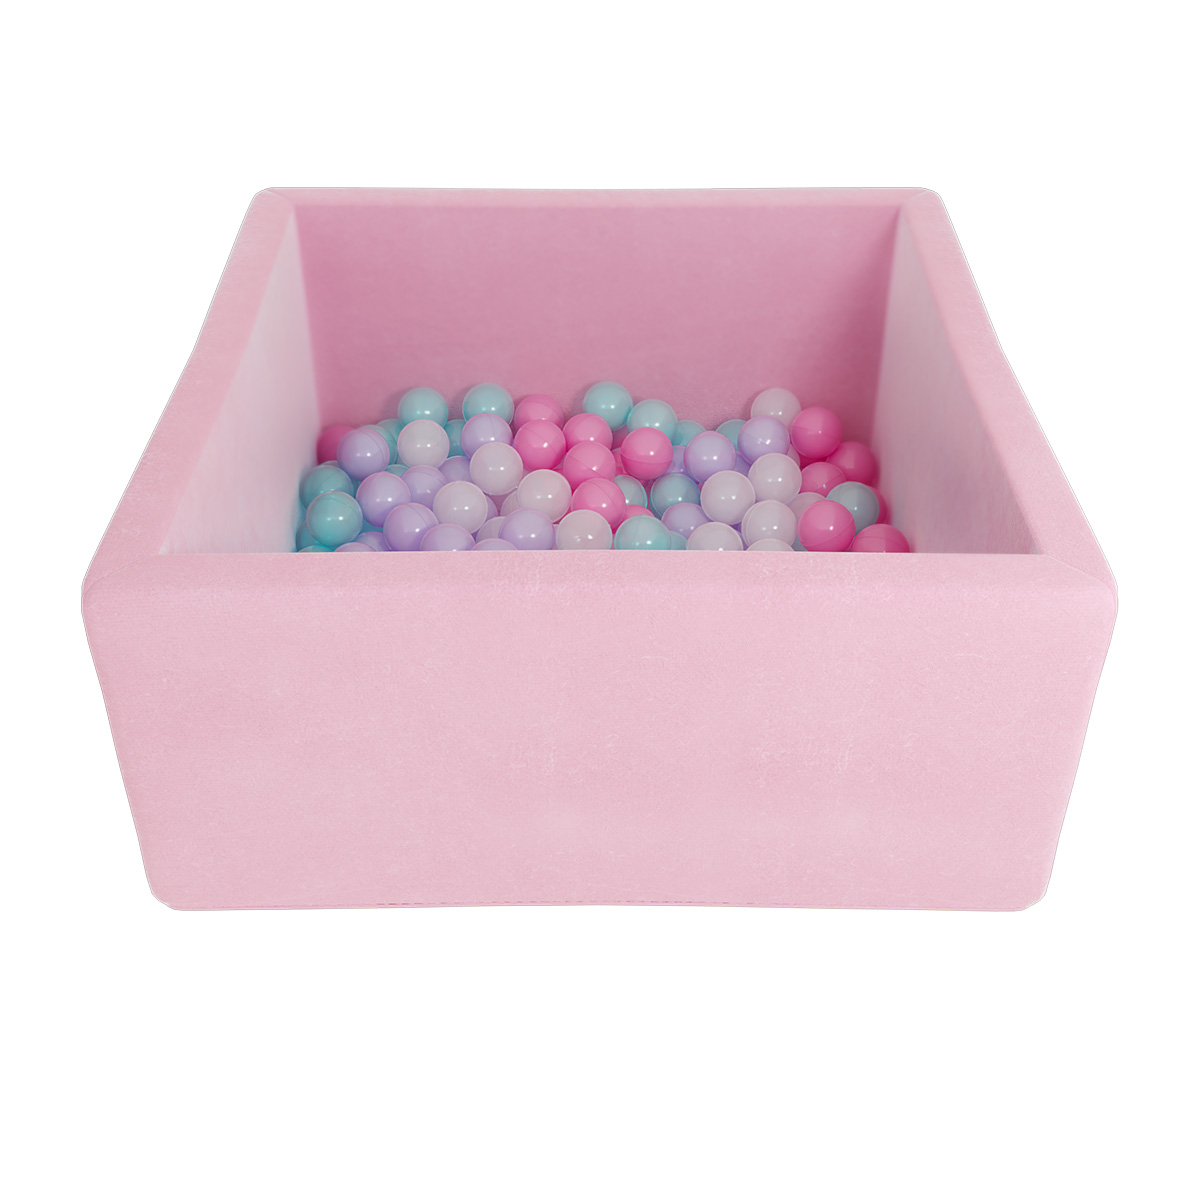 Купить Детский сухой бассейн Romana Airpool Box, розовый + 100 шаров, Romana (Романа)